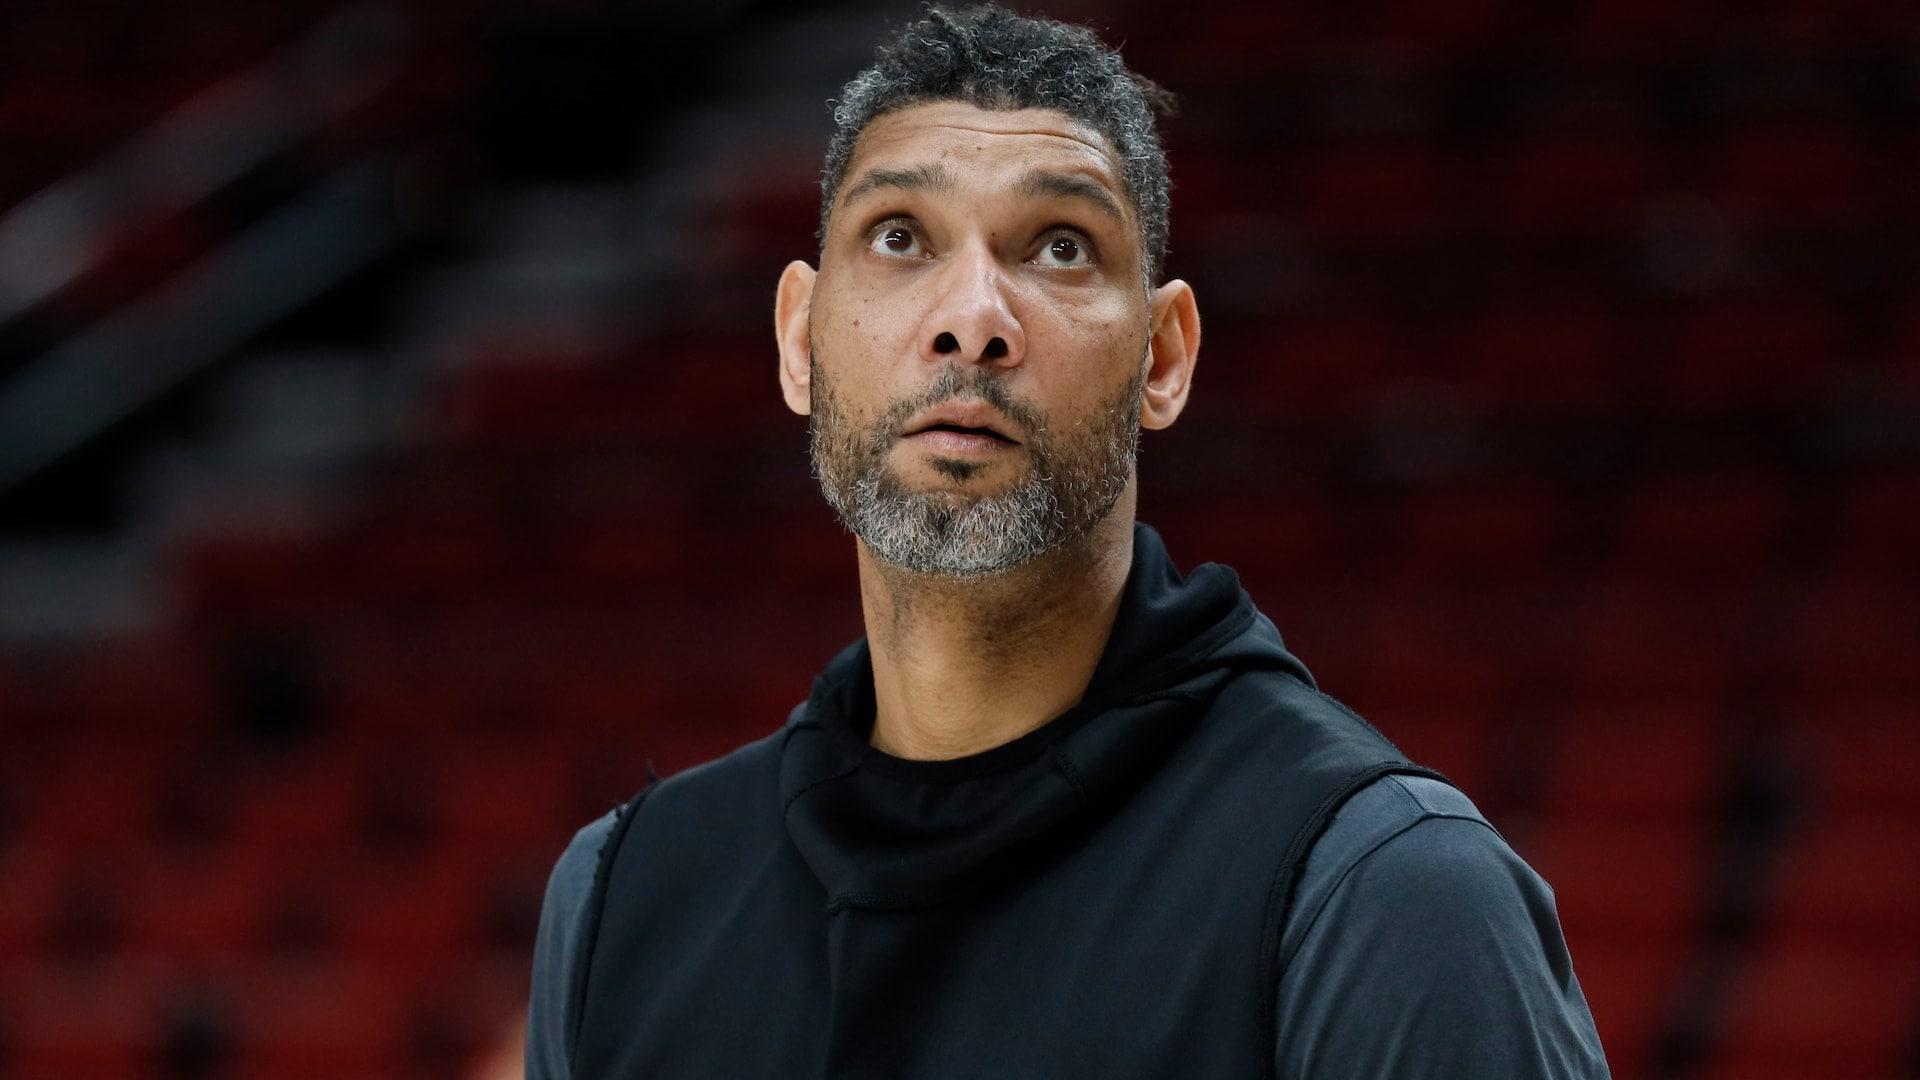 Tim Duncan stays behind as Spurs restart season in Orlando